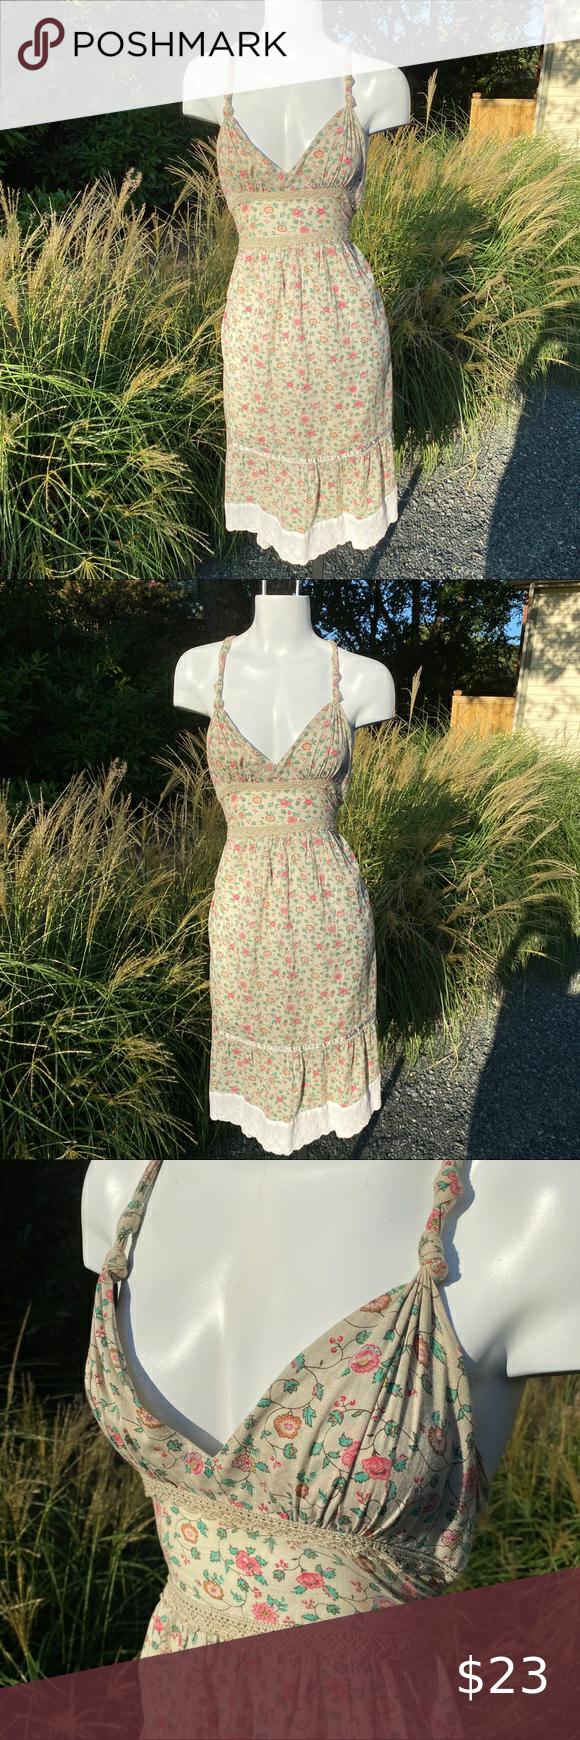 Vintage Summer Dress Vintage Summer Dresses Summer Dresses Vintage Summer [ 1740 x 580 Pixel ]